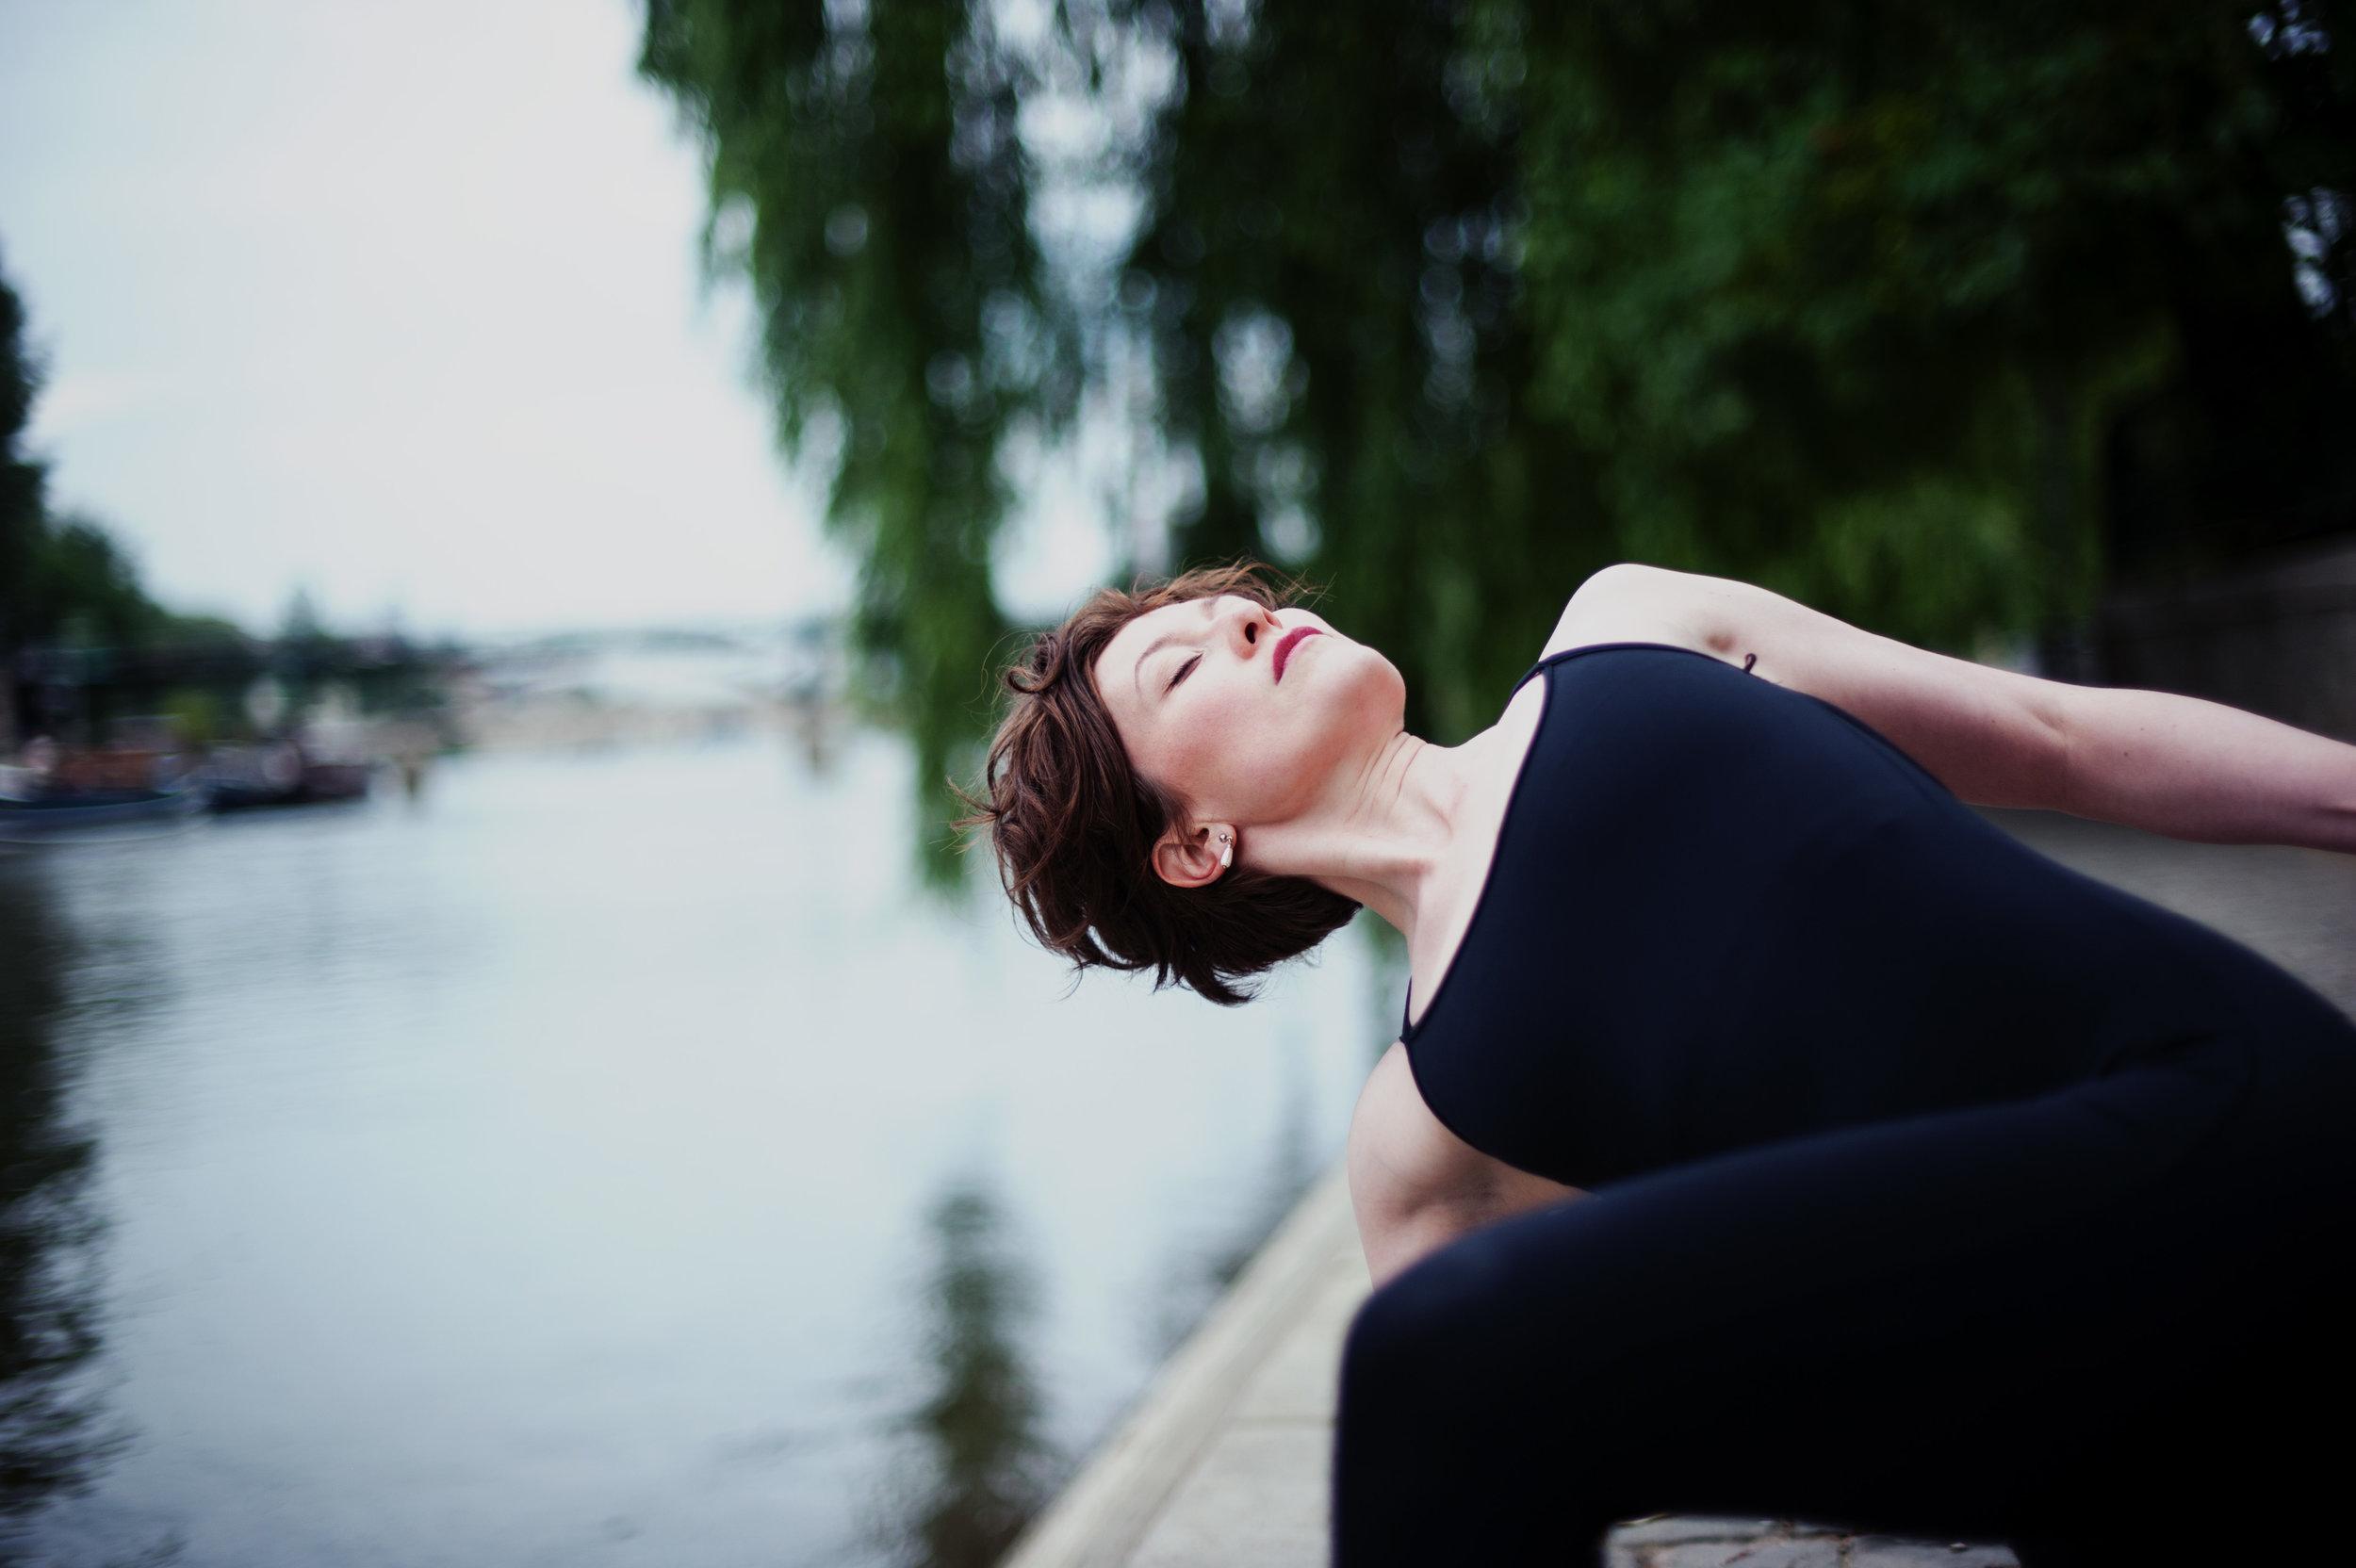 yoga-foto-paris-seine-3.jpg